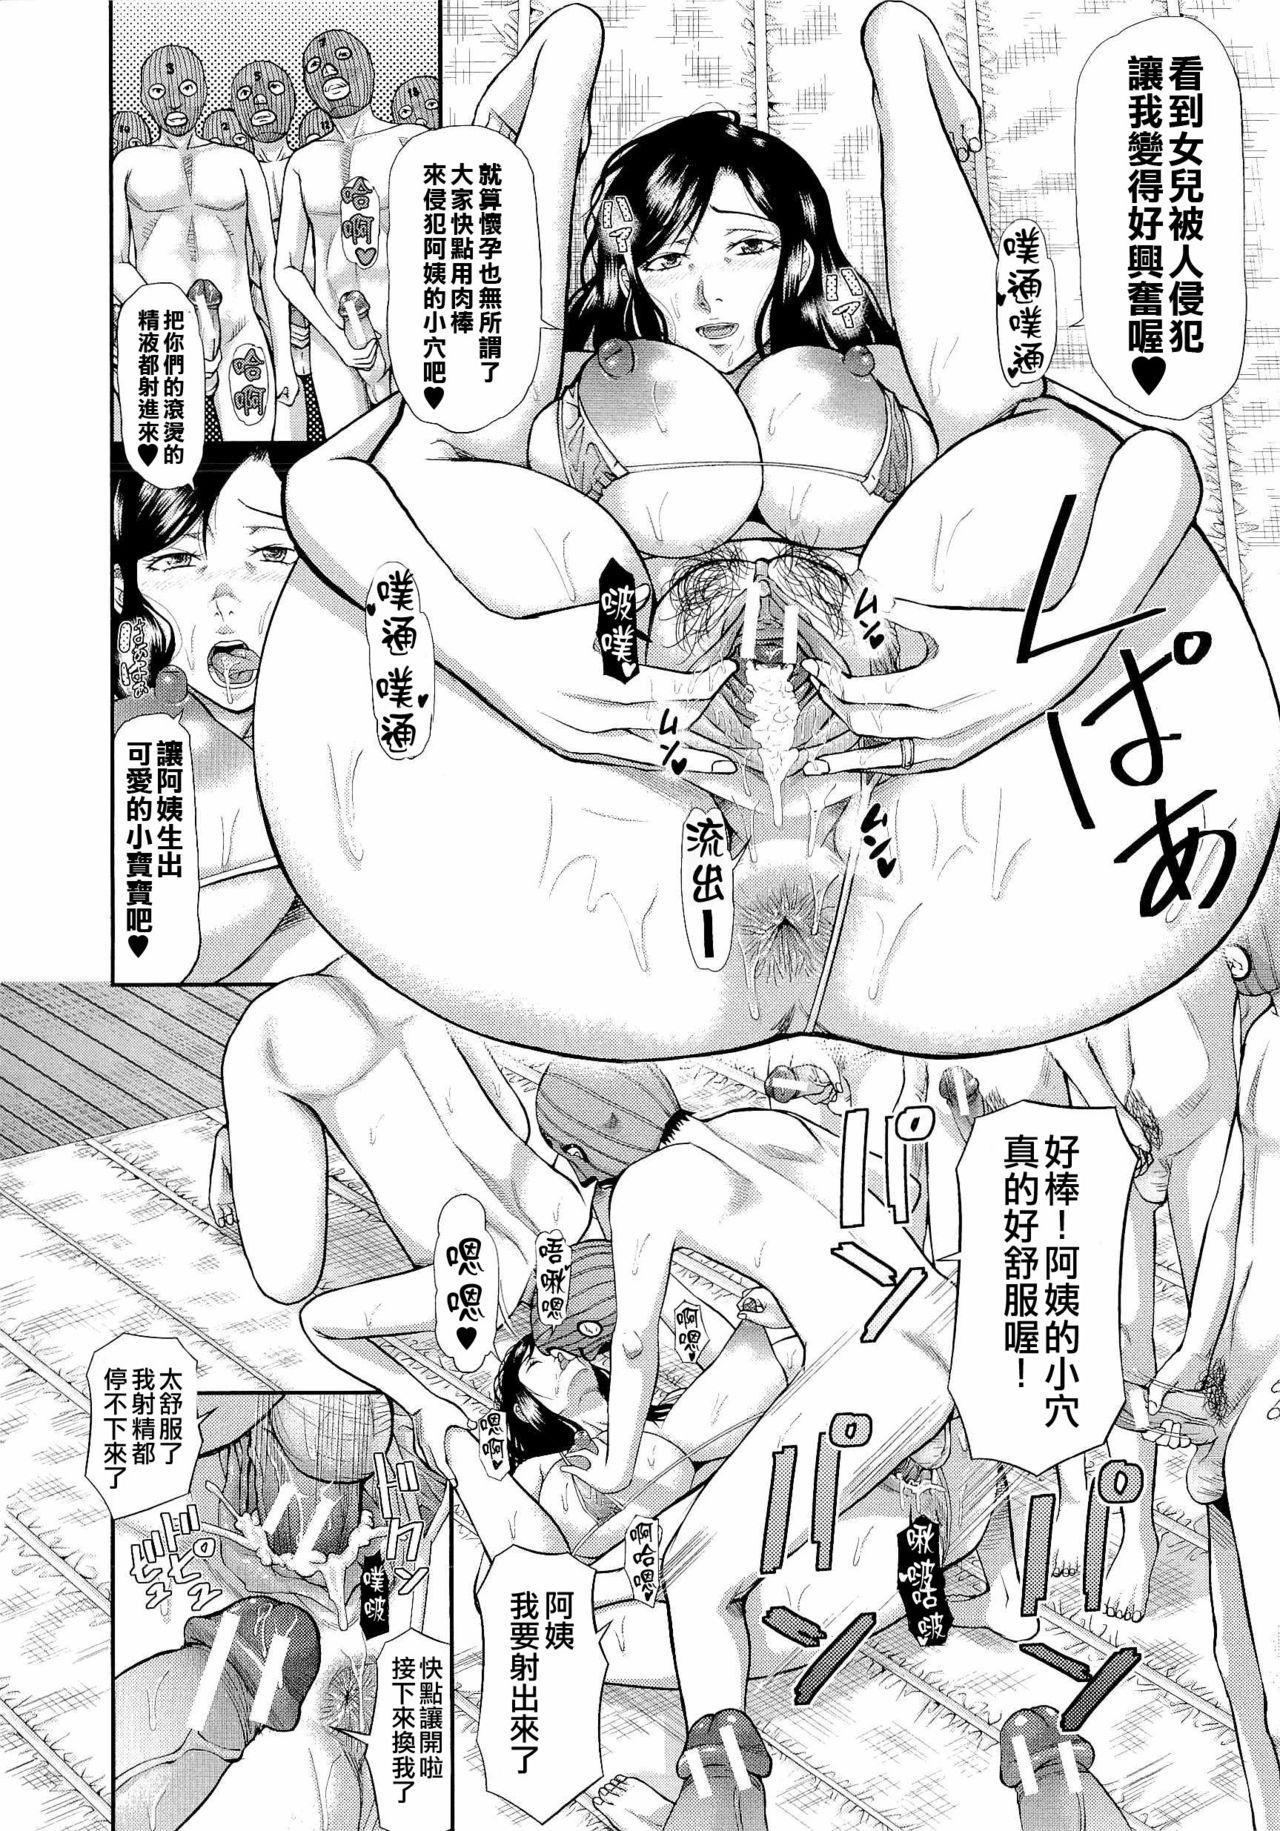 [Honebuto Danshaku] Innou Kaizou Program ~Oyako Zecchou Cult Ochi~ [Chinese]【不想记名重嵌--高质量图源】 154